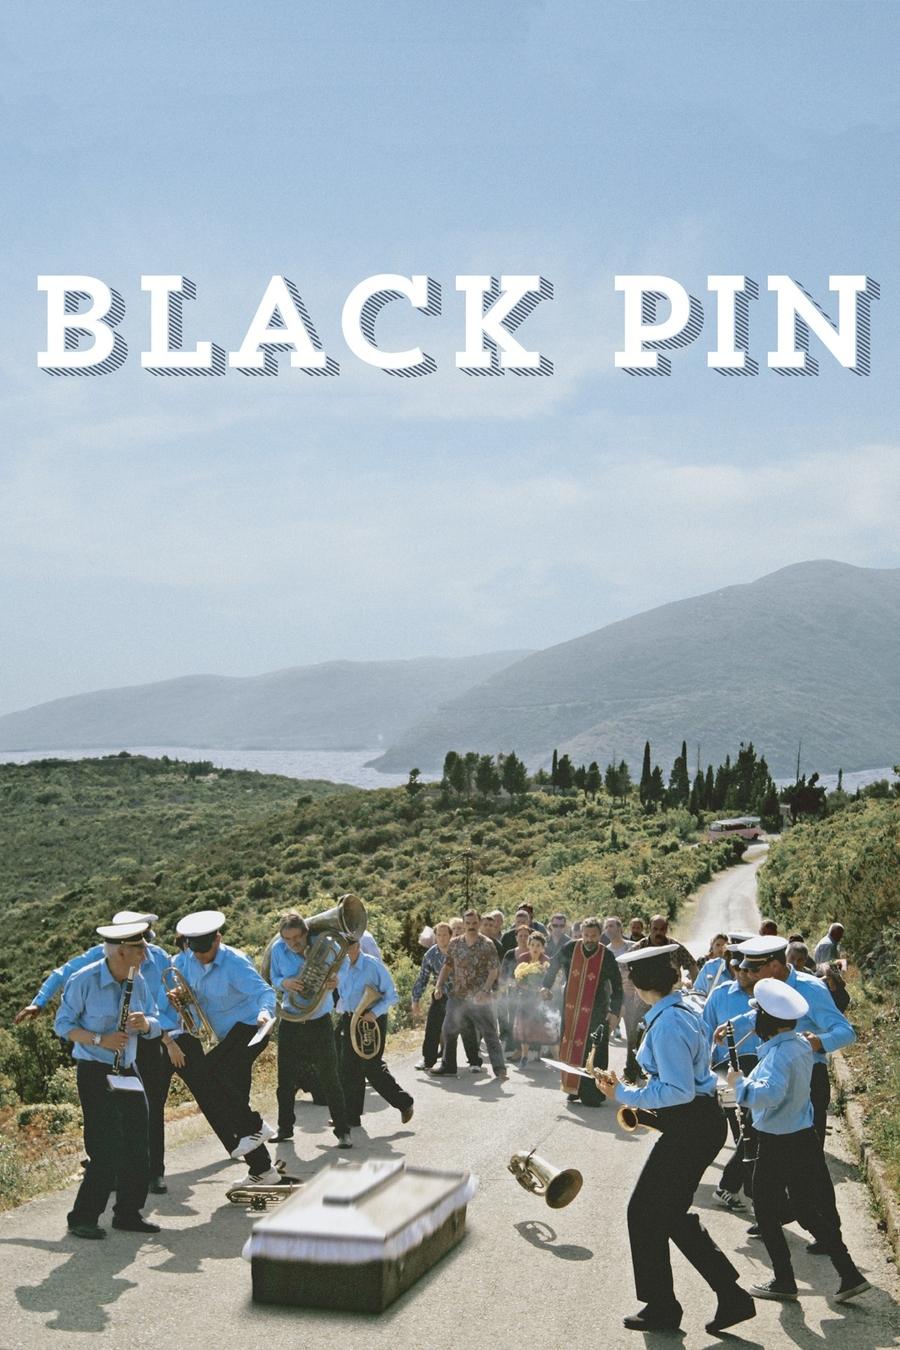 The Black Pin